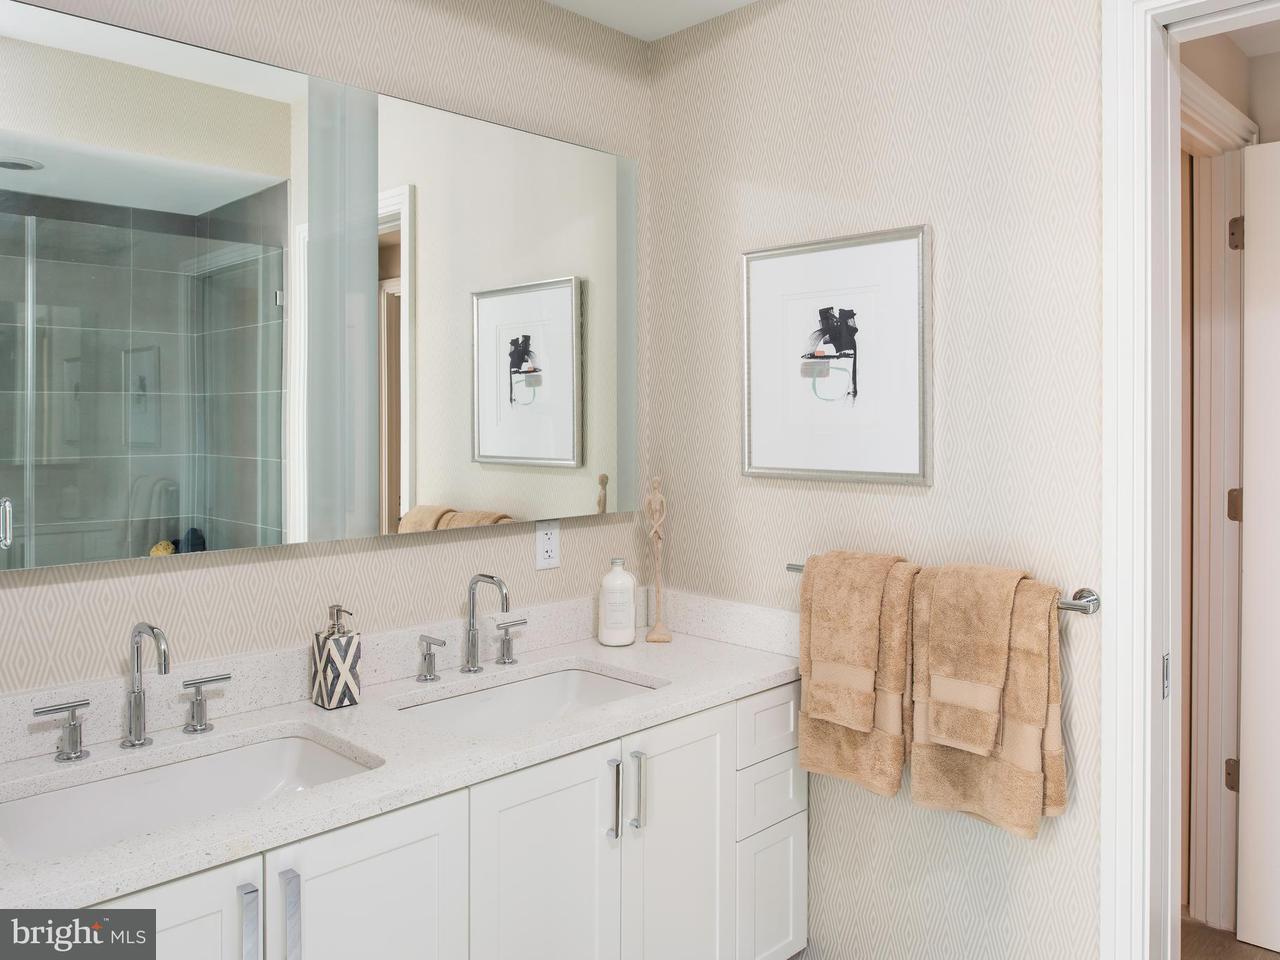 Additional photo for property listing at 8302 WOODMONT AVE #702 8302 WOODMONT AVE #702 Bethesda, Maryland 20814 United States